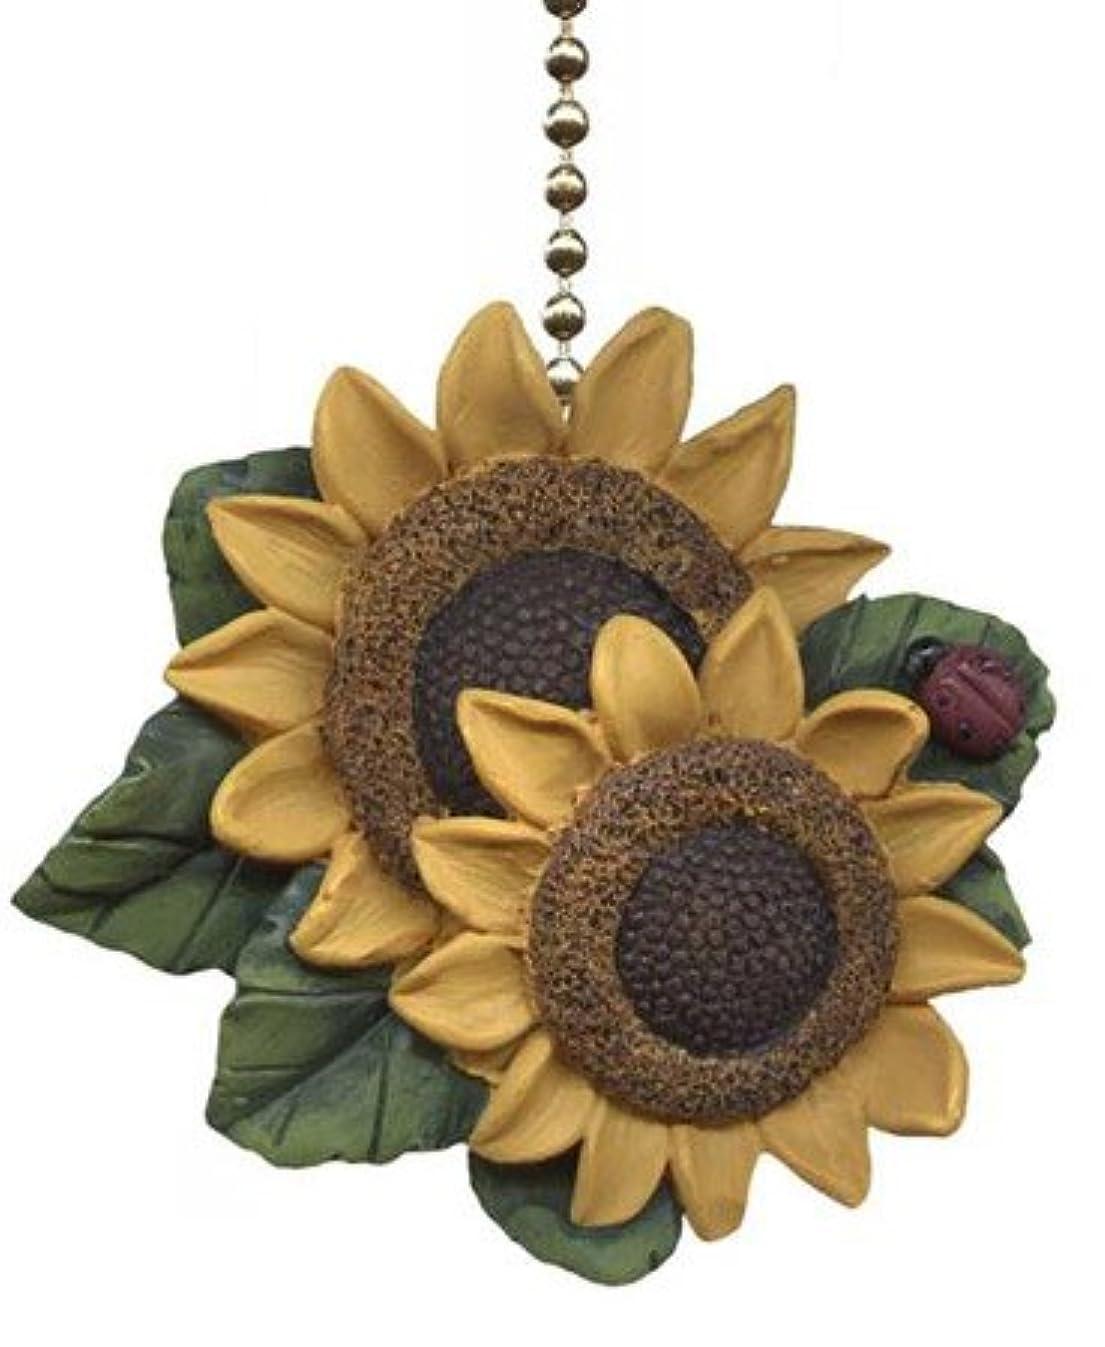 Clementine Designs Sunflower Ladybug Floral Kitchen Ceiling Fan or Light Pull